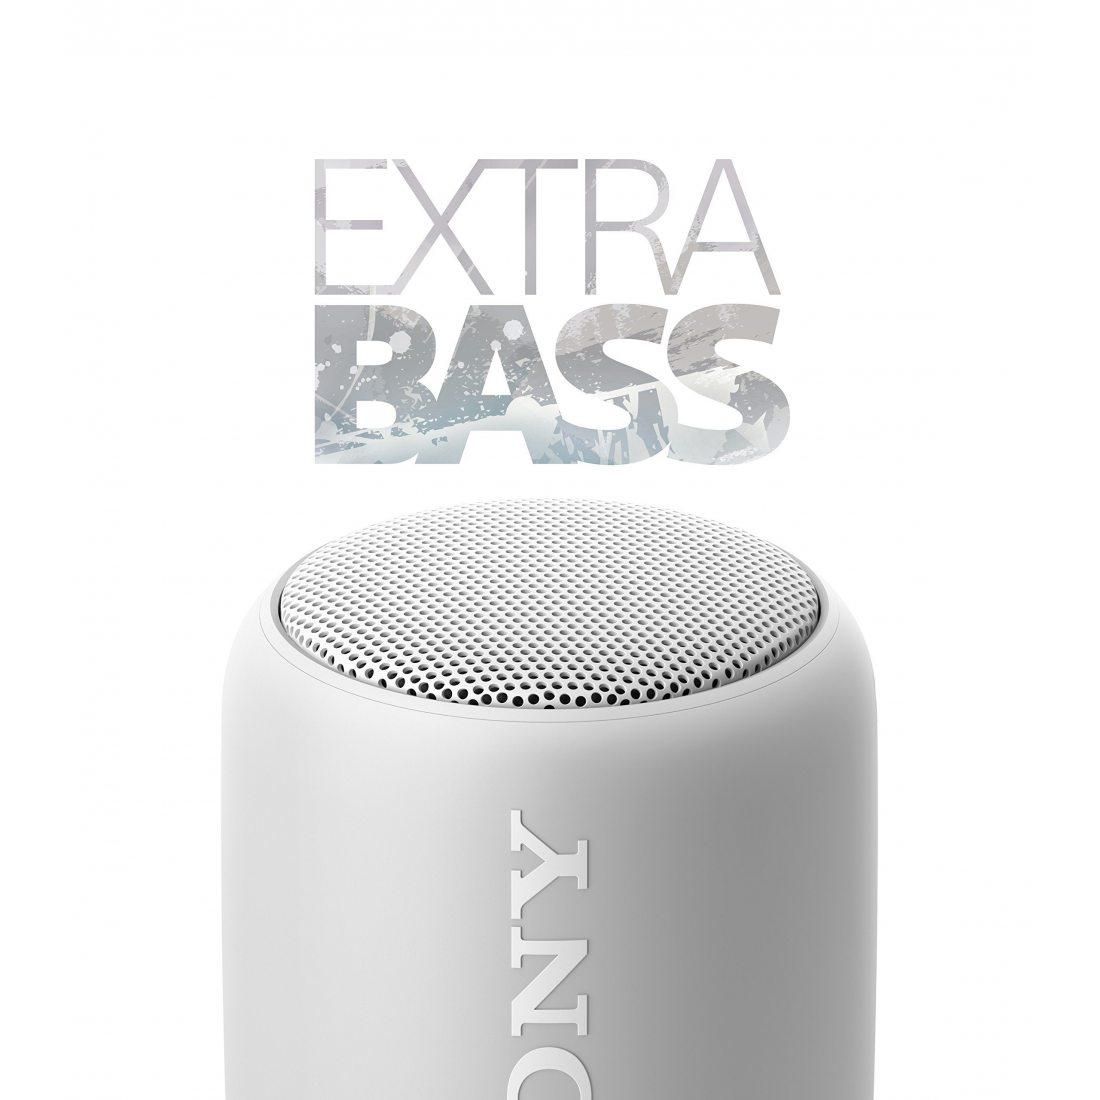 Sony SRS-XB10W Enceinte portable compacte sans fil Bluetooth NFC - Blanc